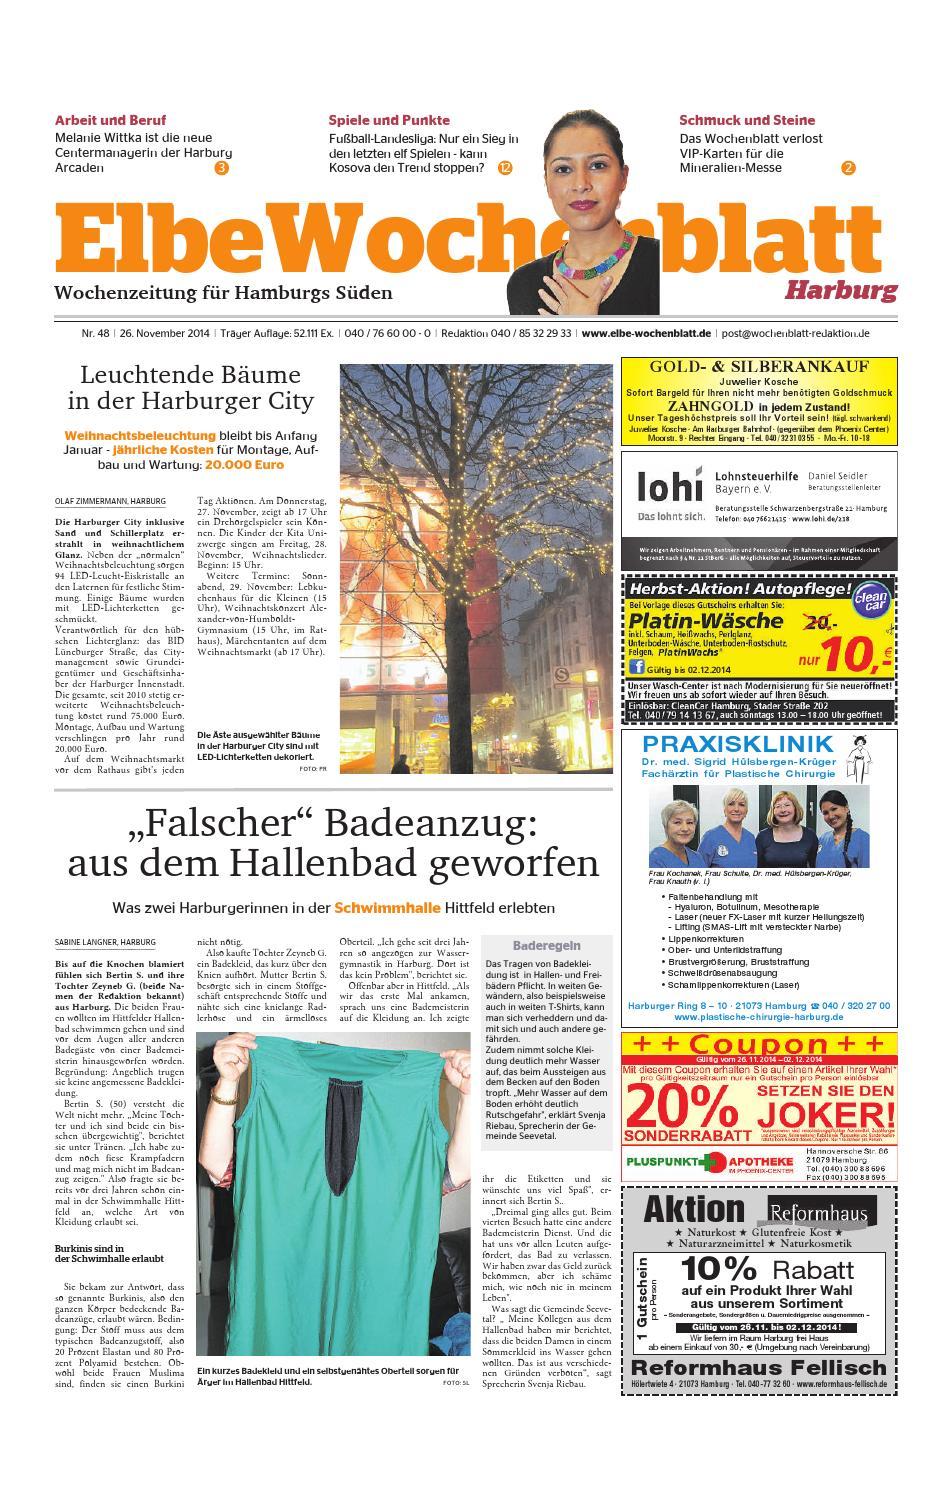 Harburg KW48-2014 by Elbe Wochenblatt Verlagsgesellschaft mbH & Co.KG -  issuu